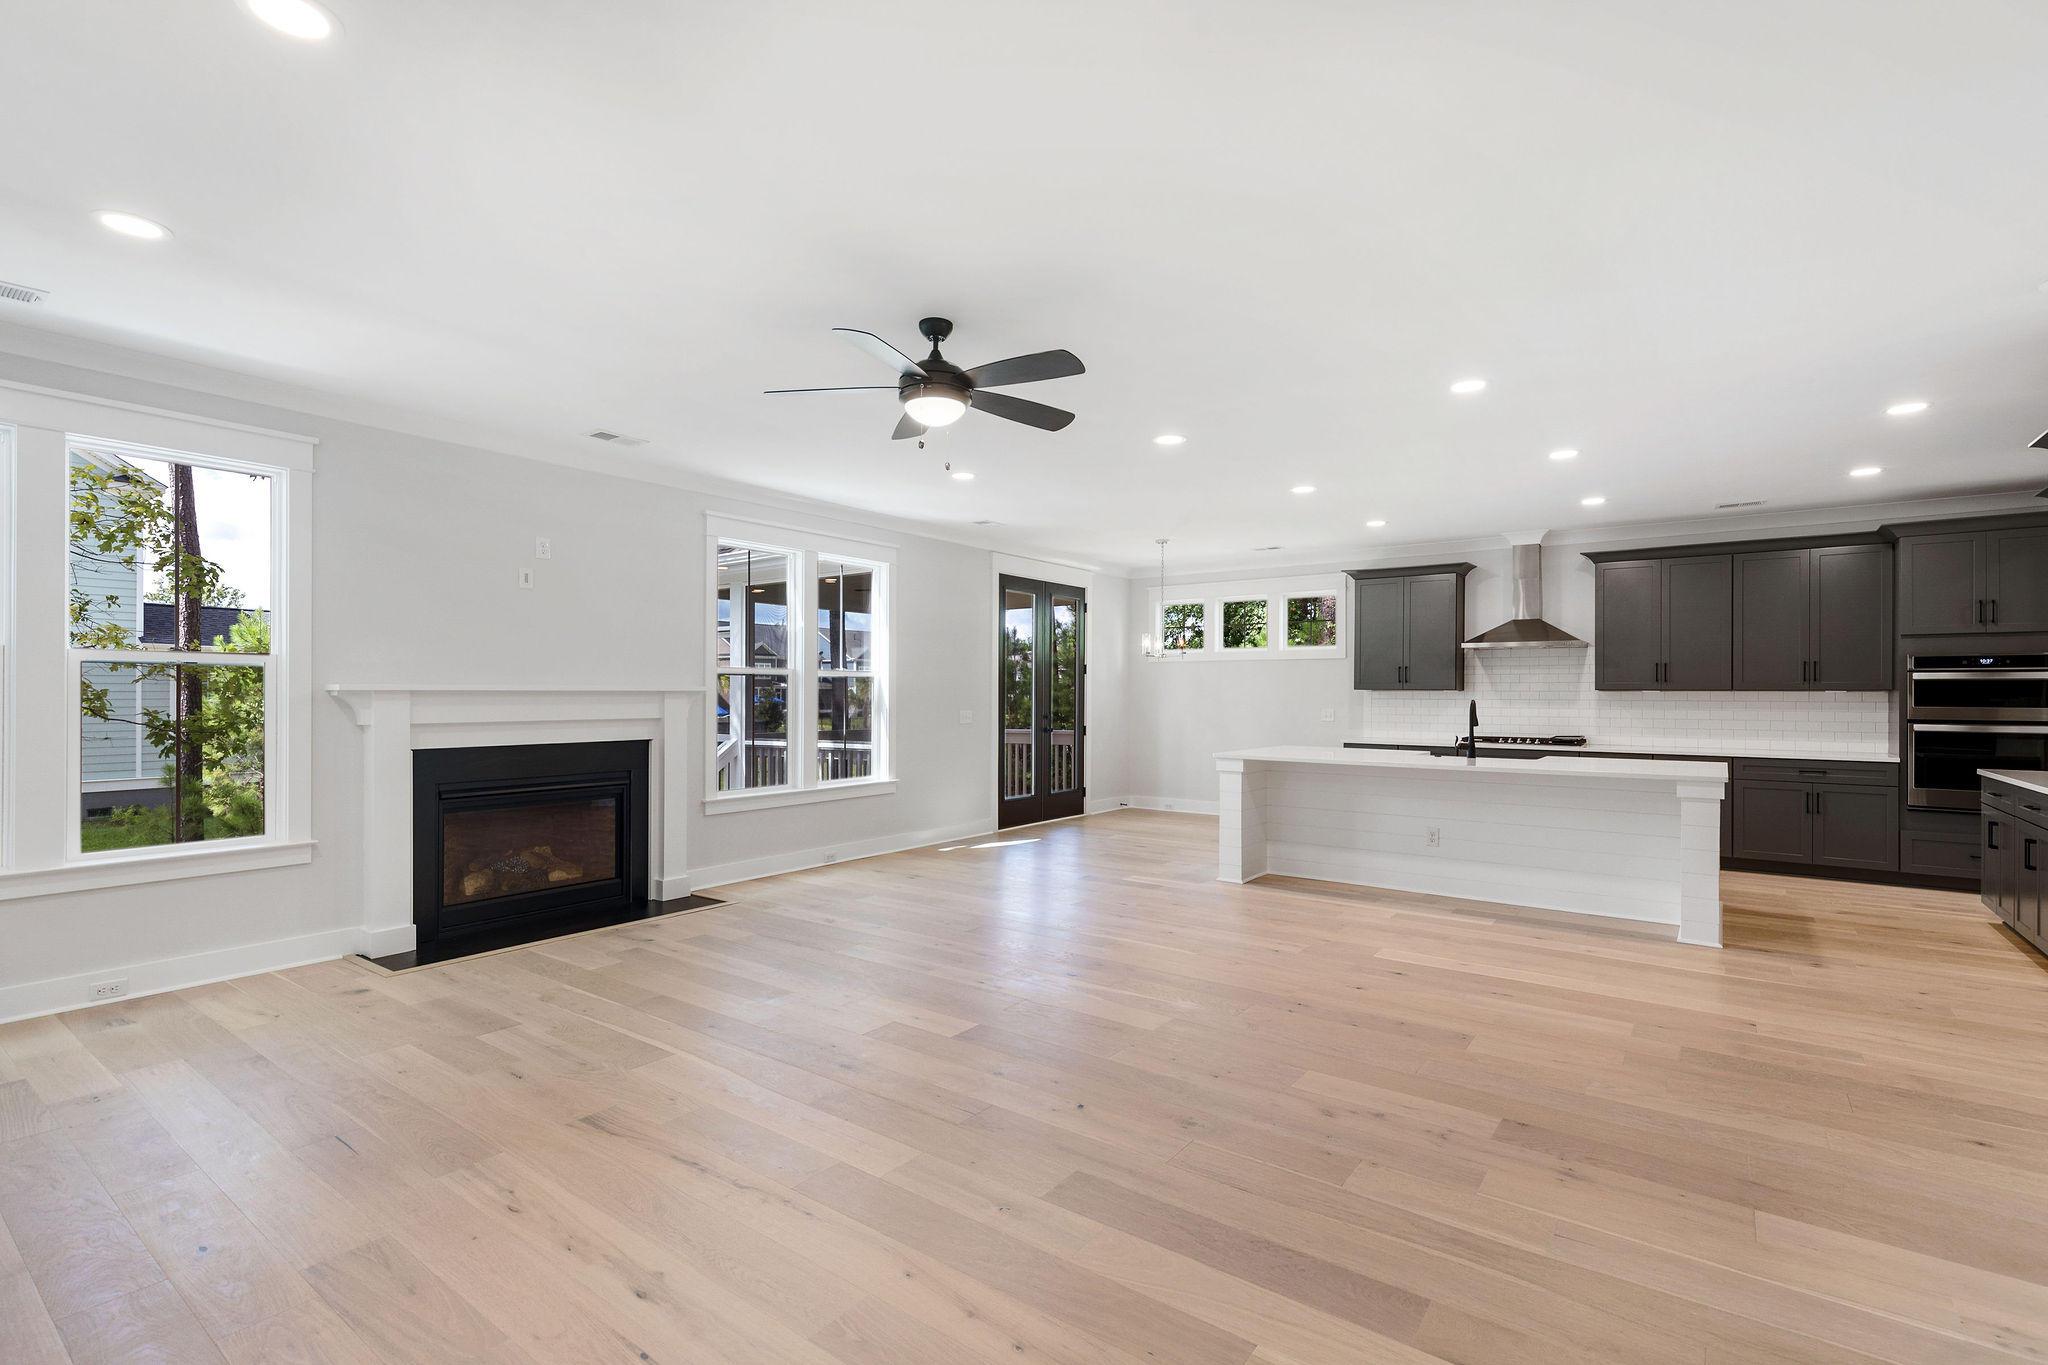 Park West Homes For Sale - 2291 Middlesex, Mount Pleasant, SC - 50